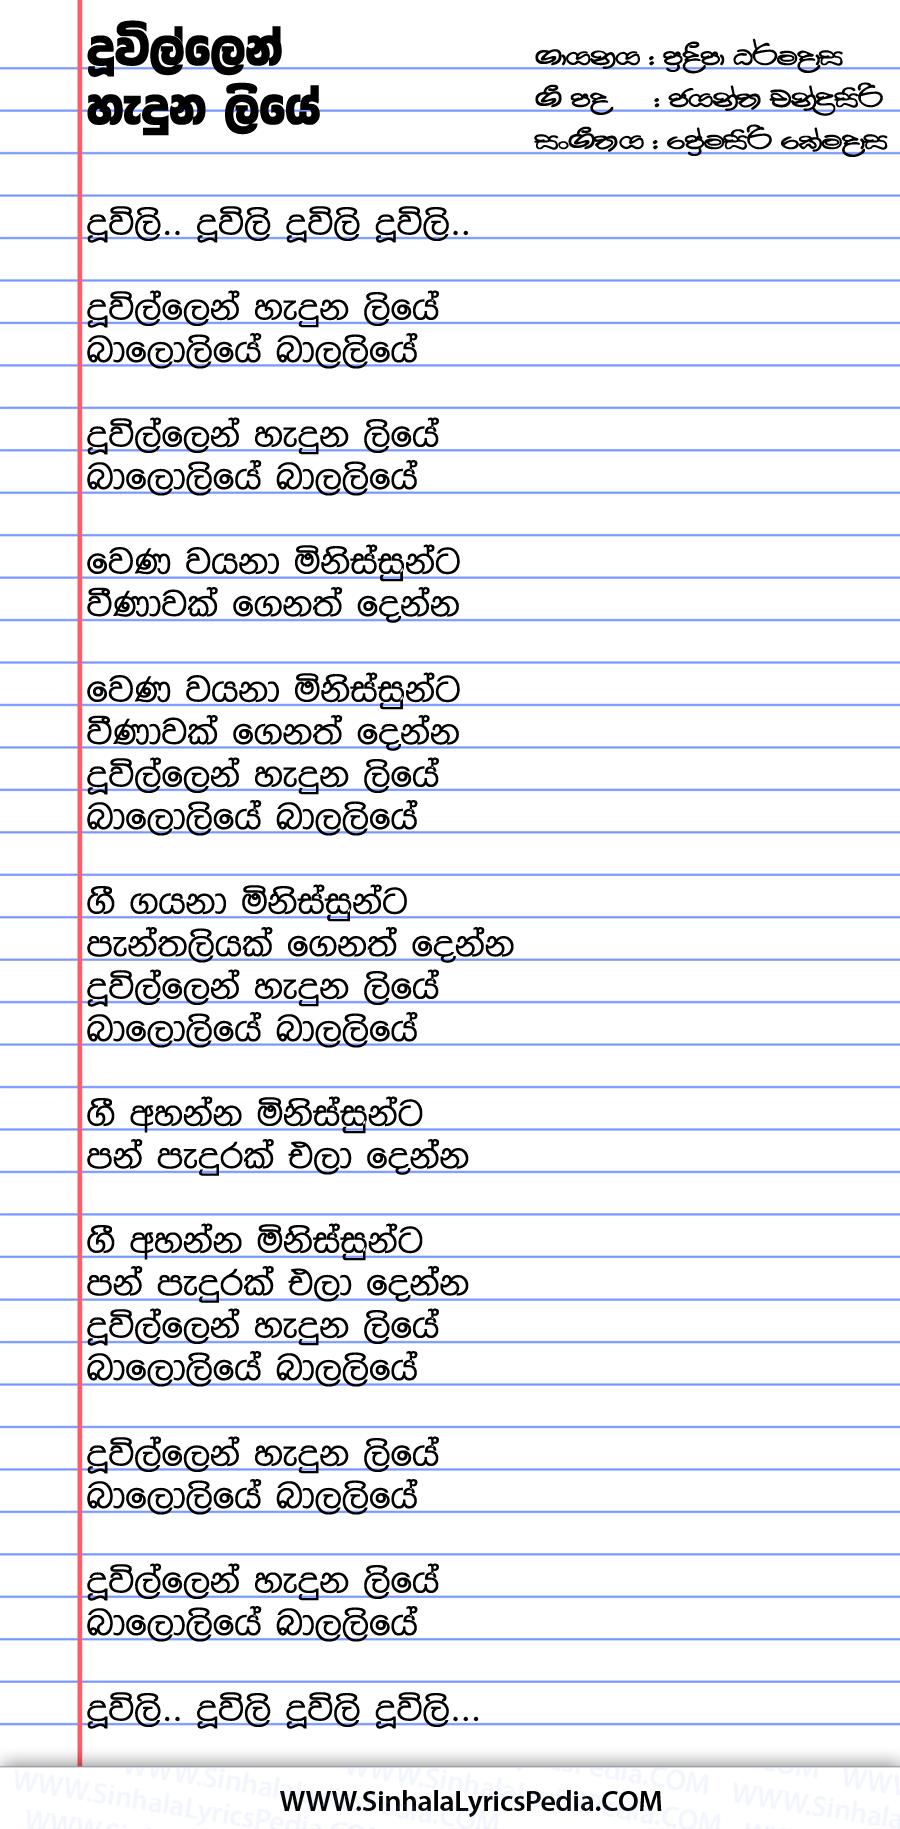 Duwillen Saduna Liye Song Lyrics